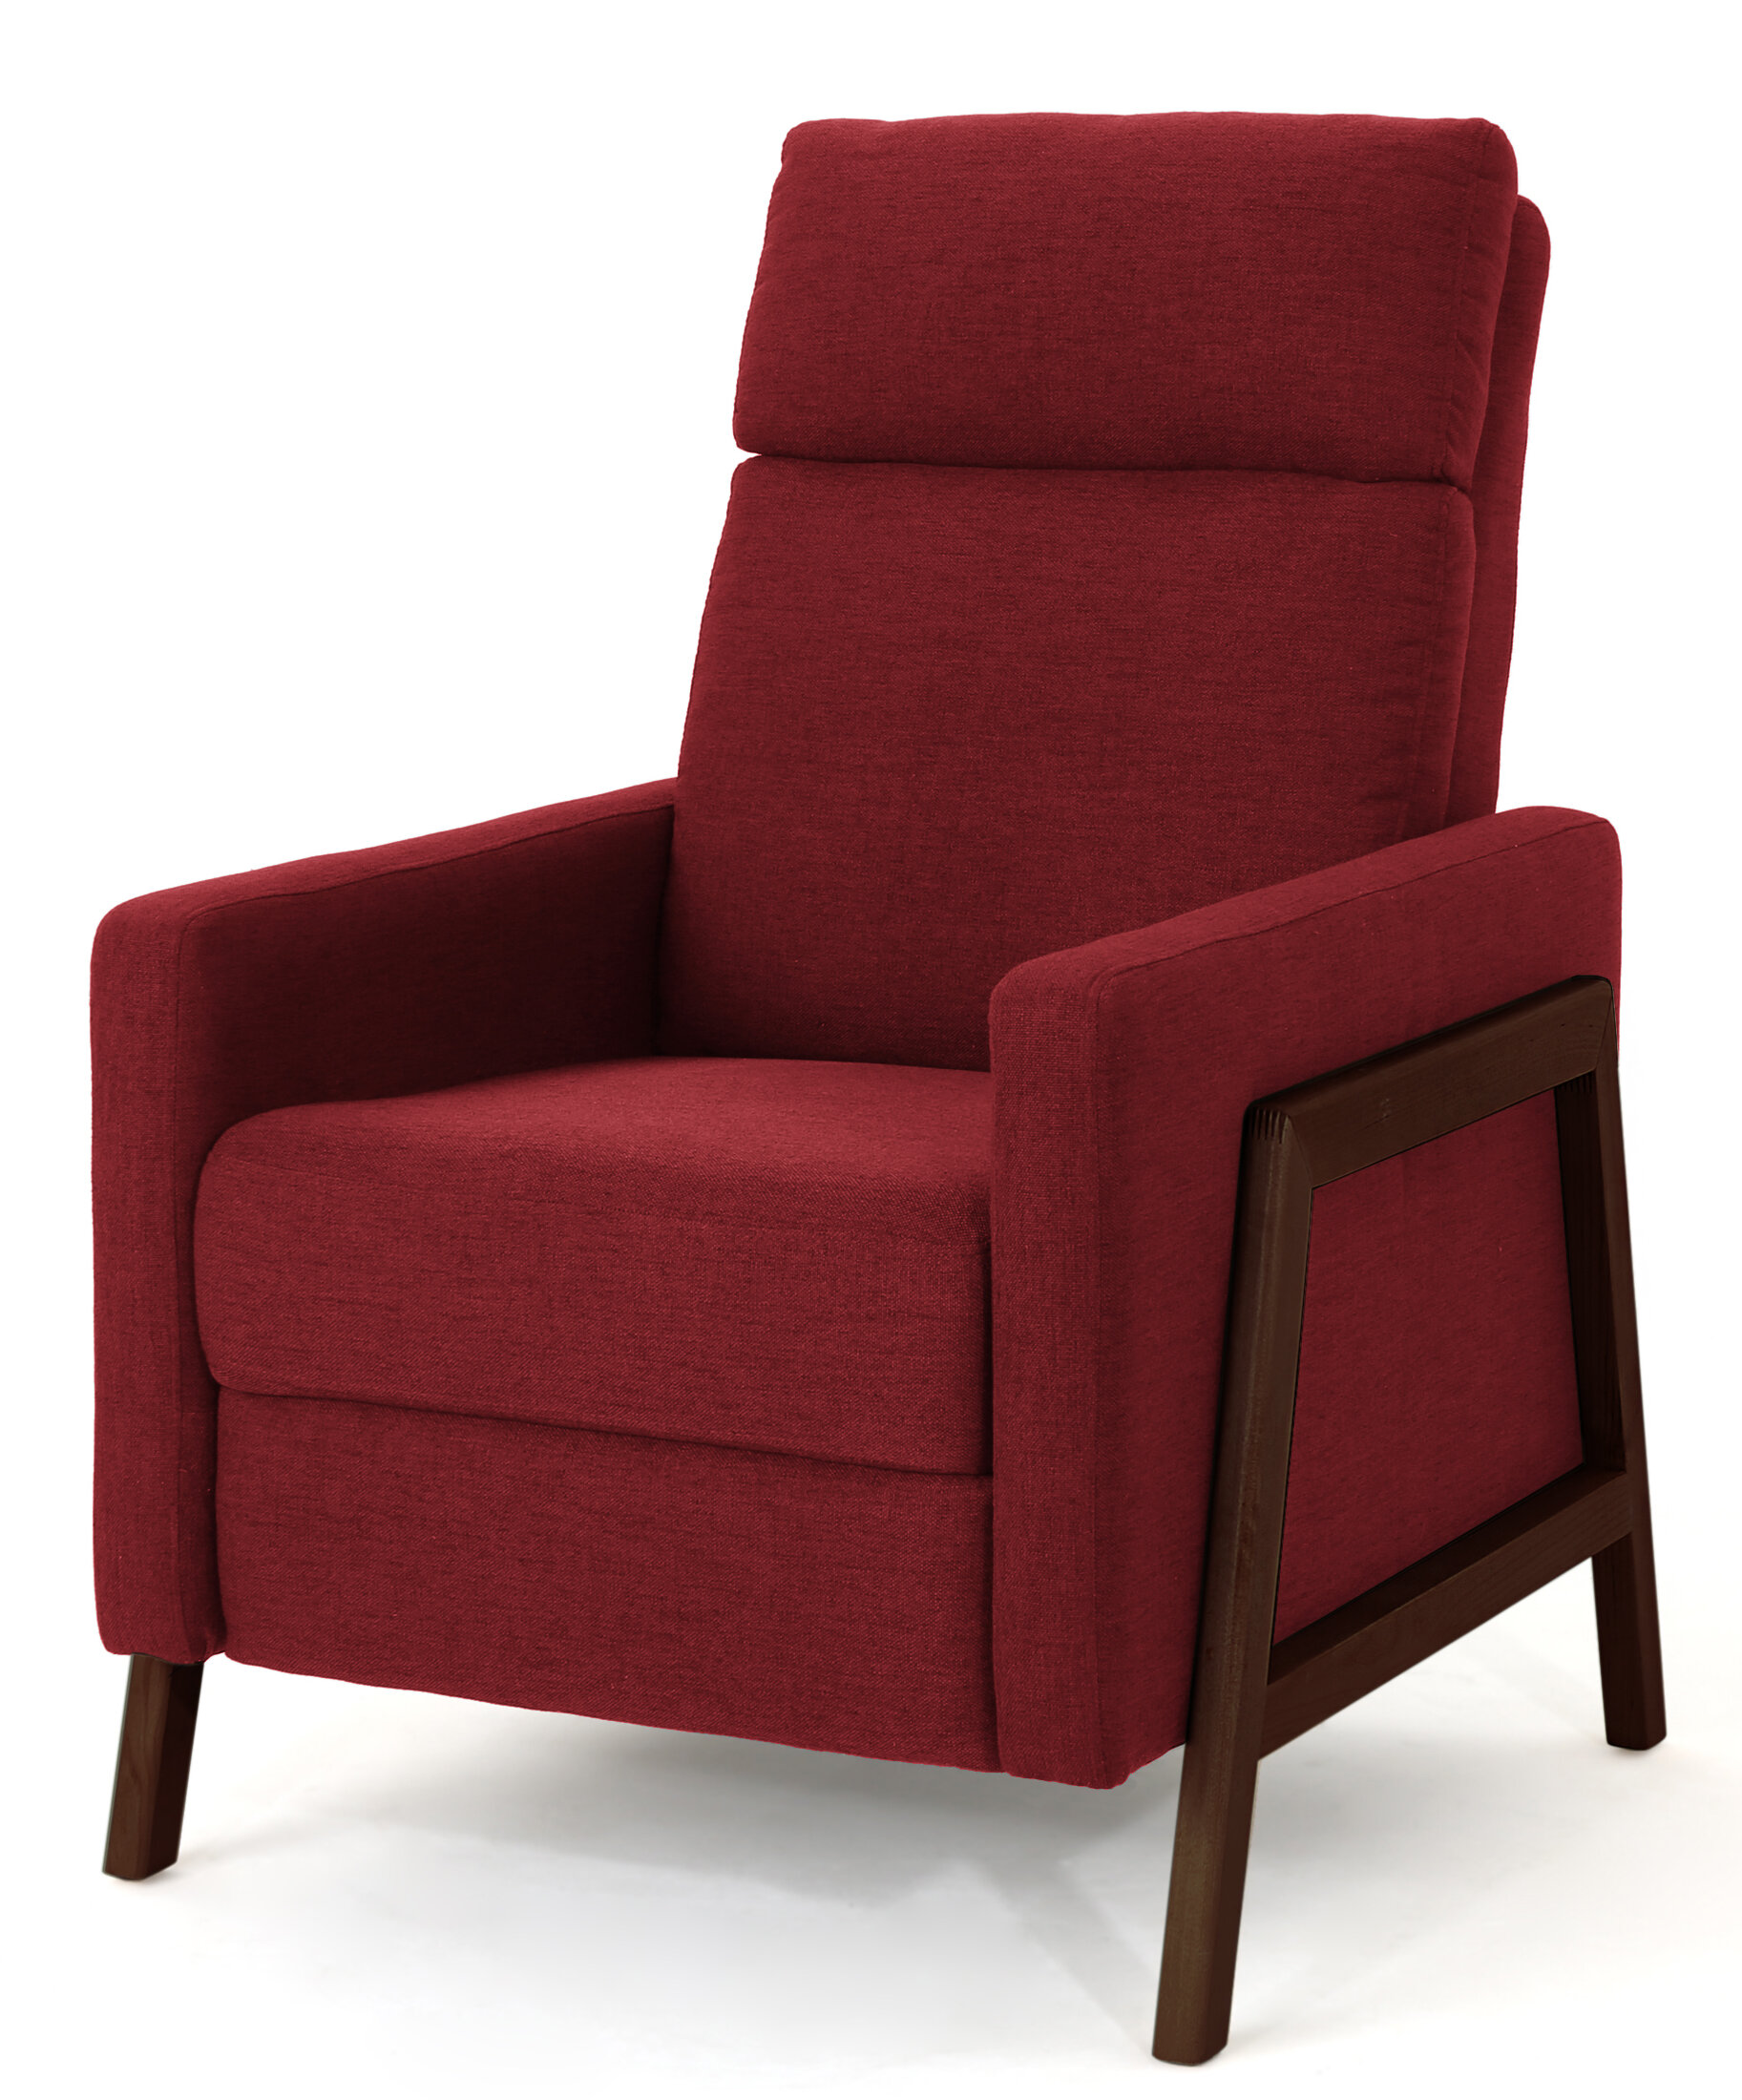 Terrific Linehan Modern Manual Recliner Uwap Interior Chair Design Uwaporg